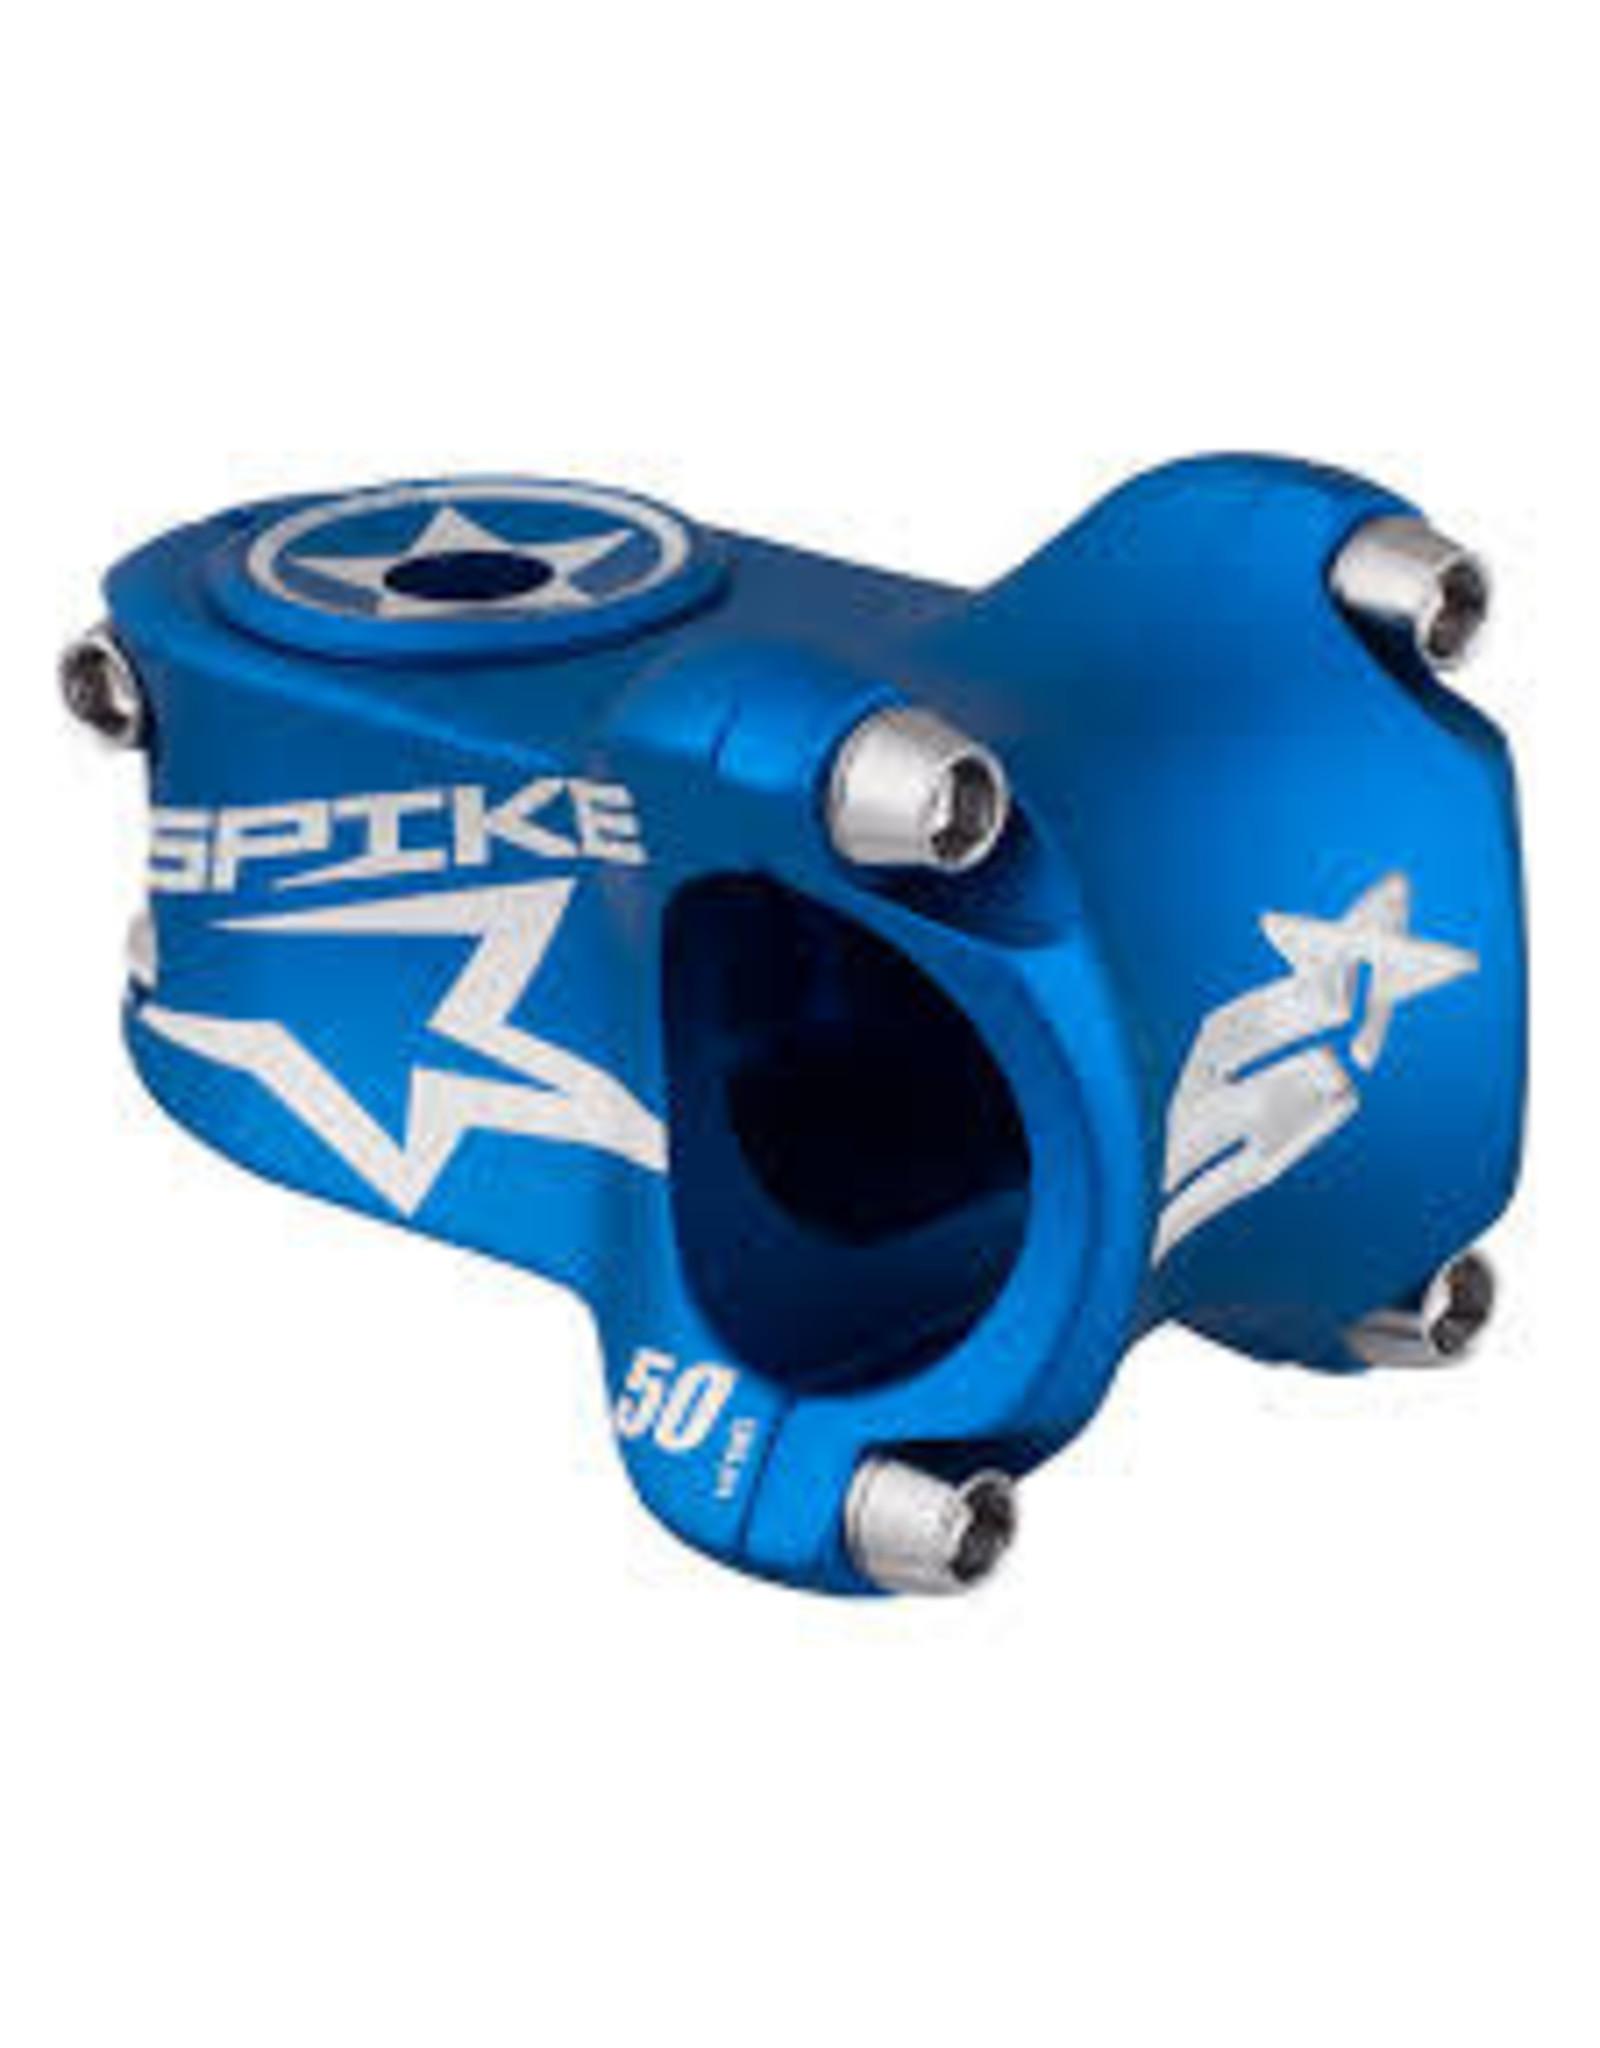 Spank Spank spike race stem 50mm blue